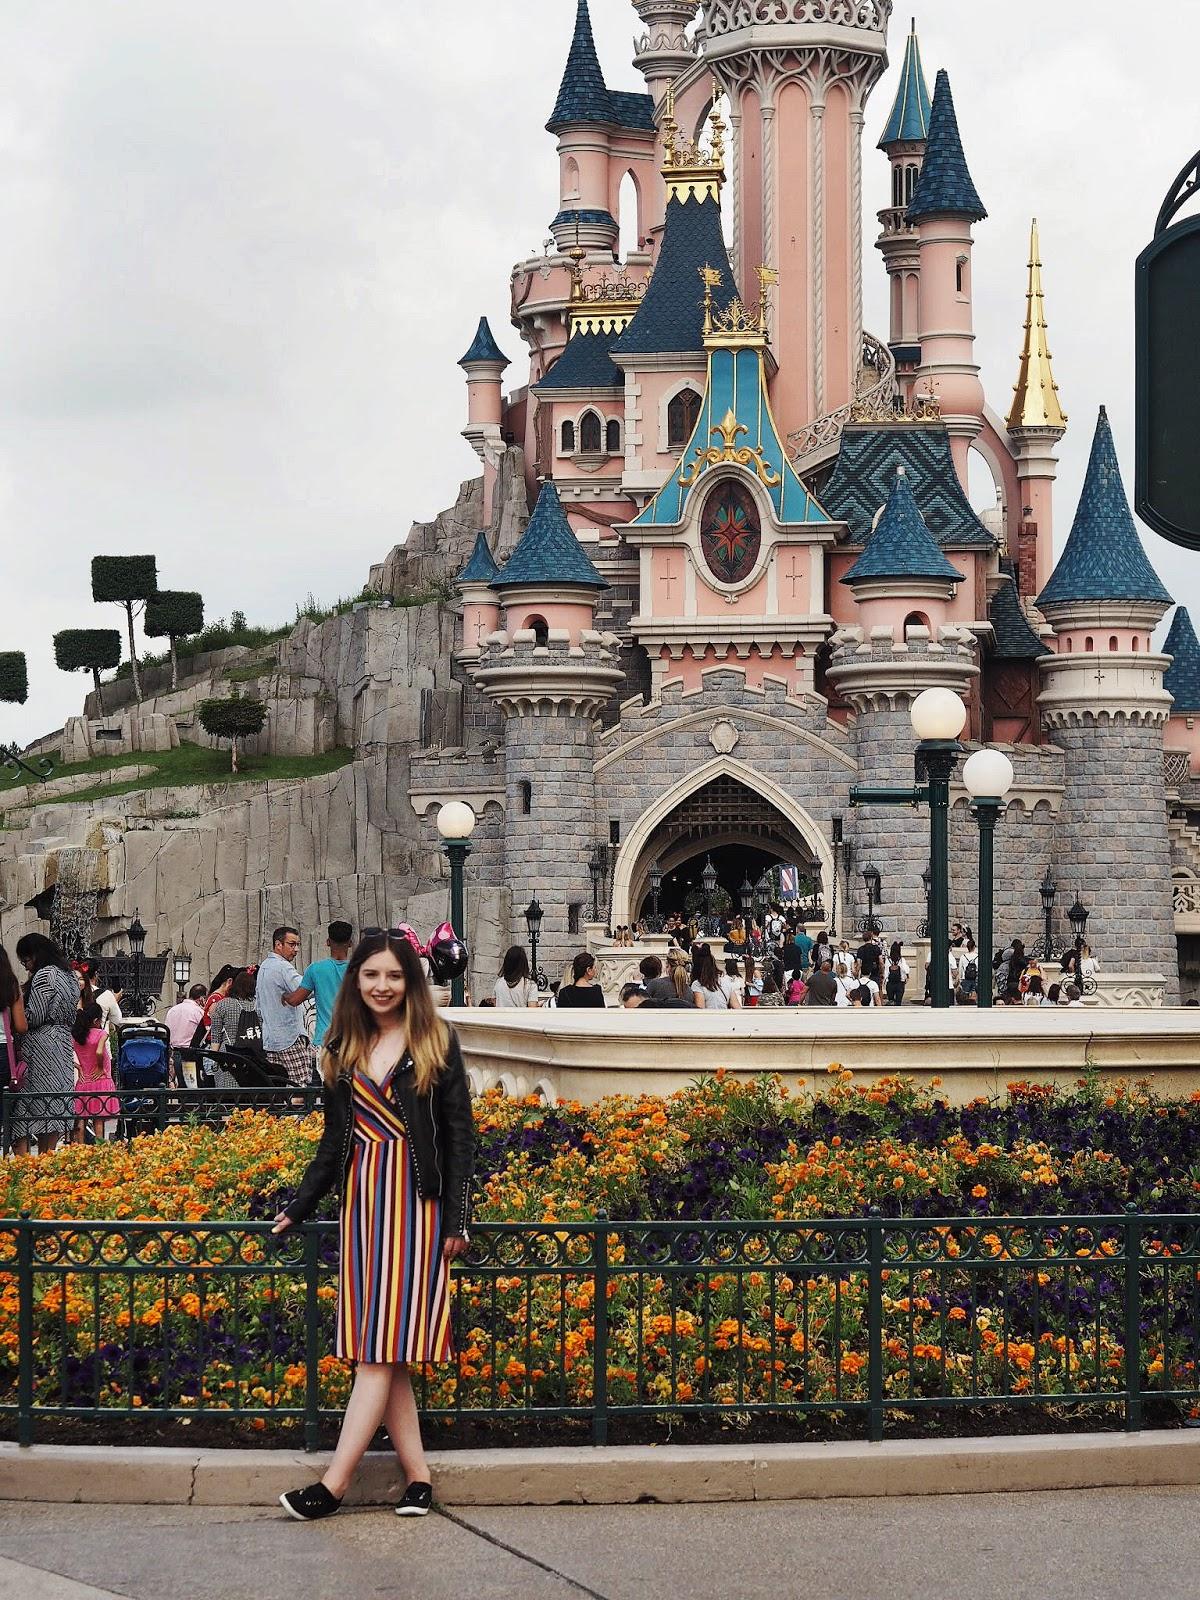 Disneyland Paris   Disneyland Palace   Cinderella